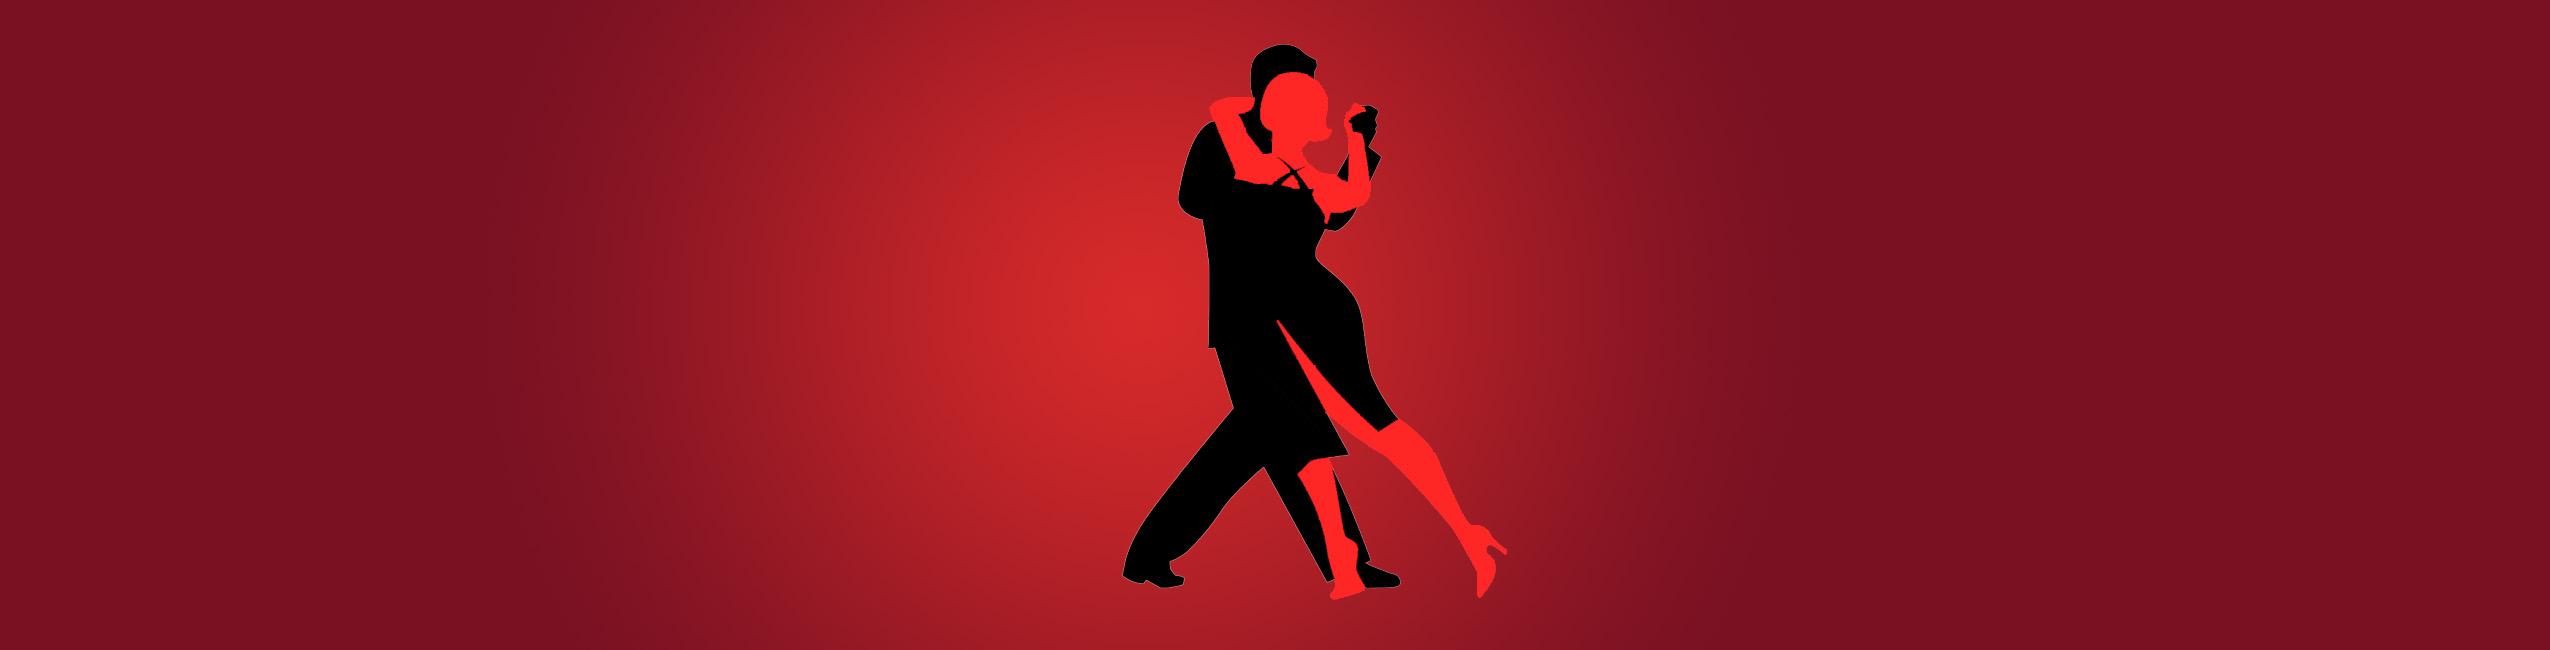 Tango in Café de Kroon